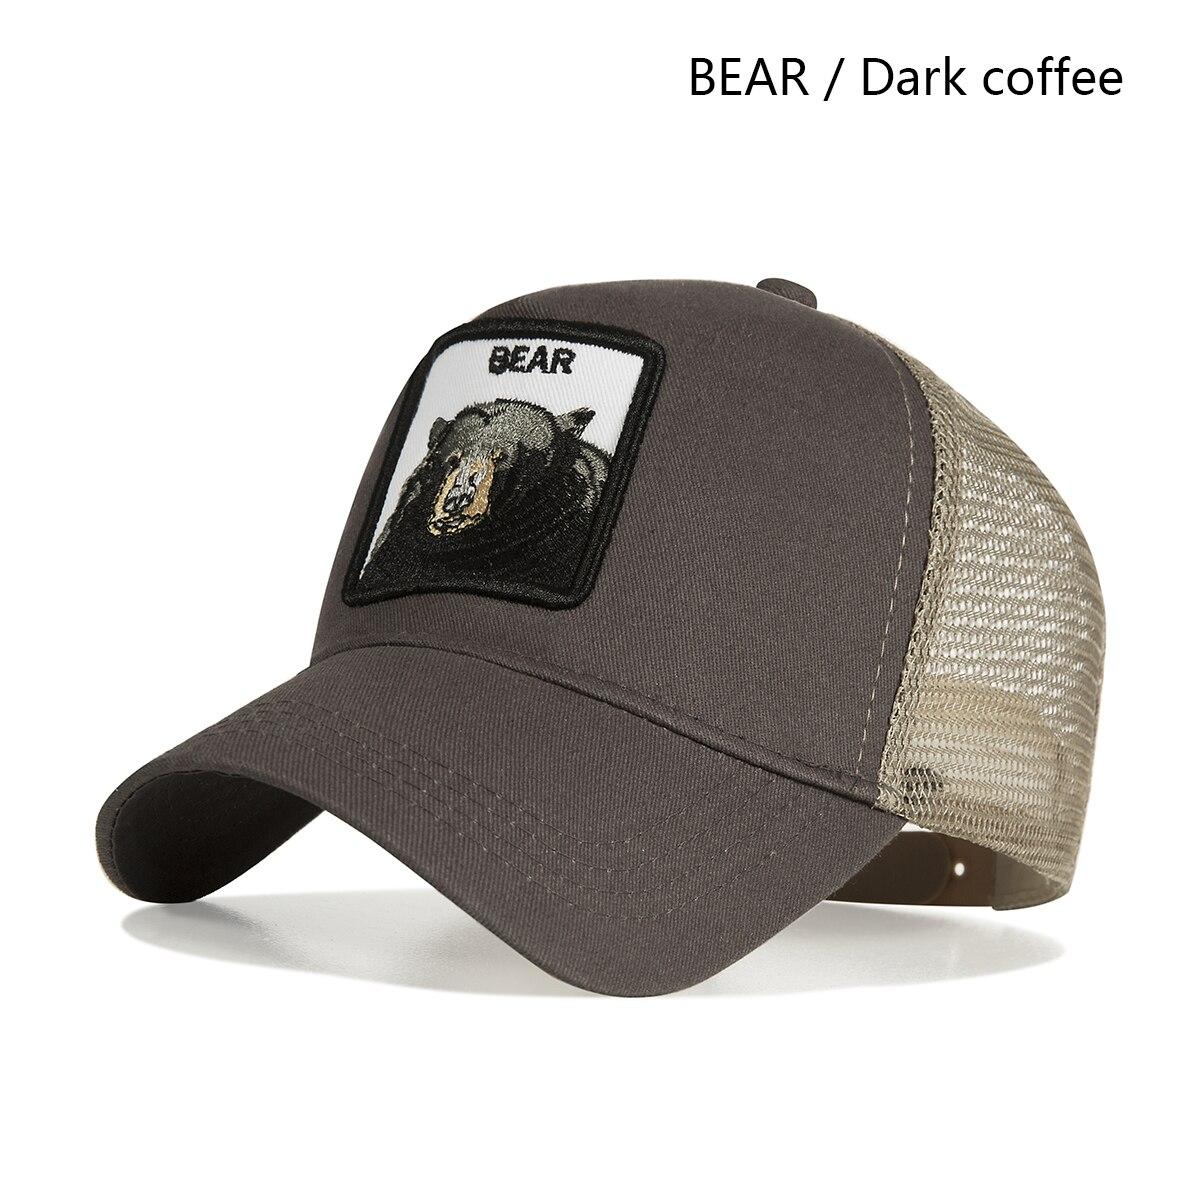 dark coffee bear